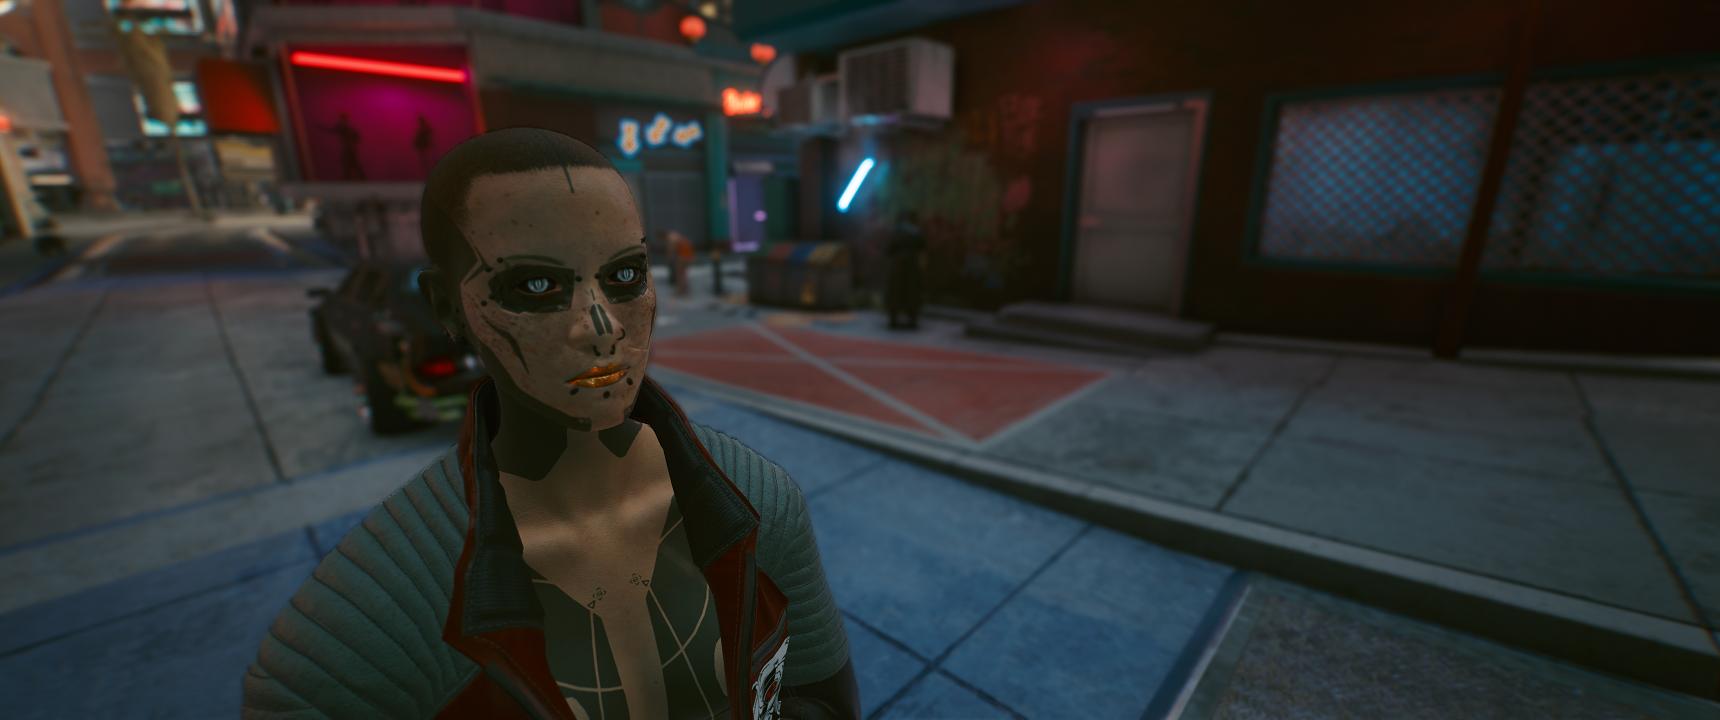 Cyberpunk 2077 Screenshot 2020.12.10 - 22.15.38.77.png